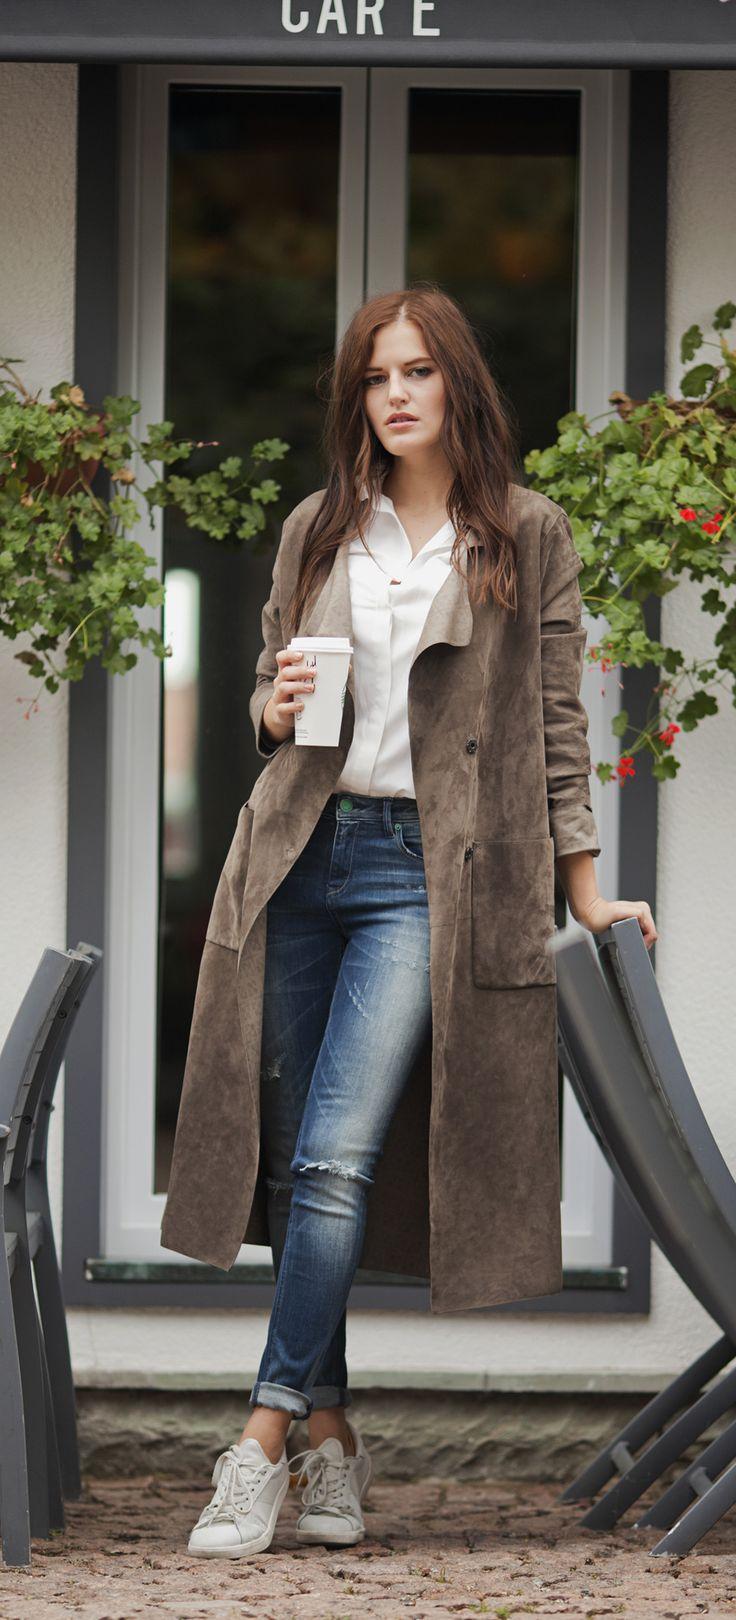 Grey suede duster coat by ADAMOFUR #suede #dustercoat #70s #bohi #chic #casual #minimal